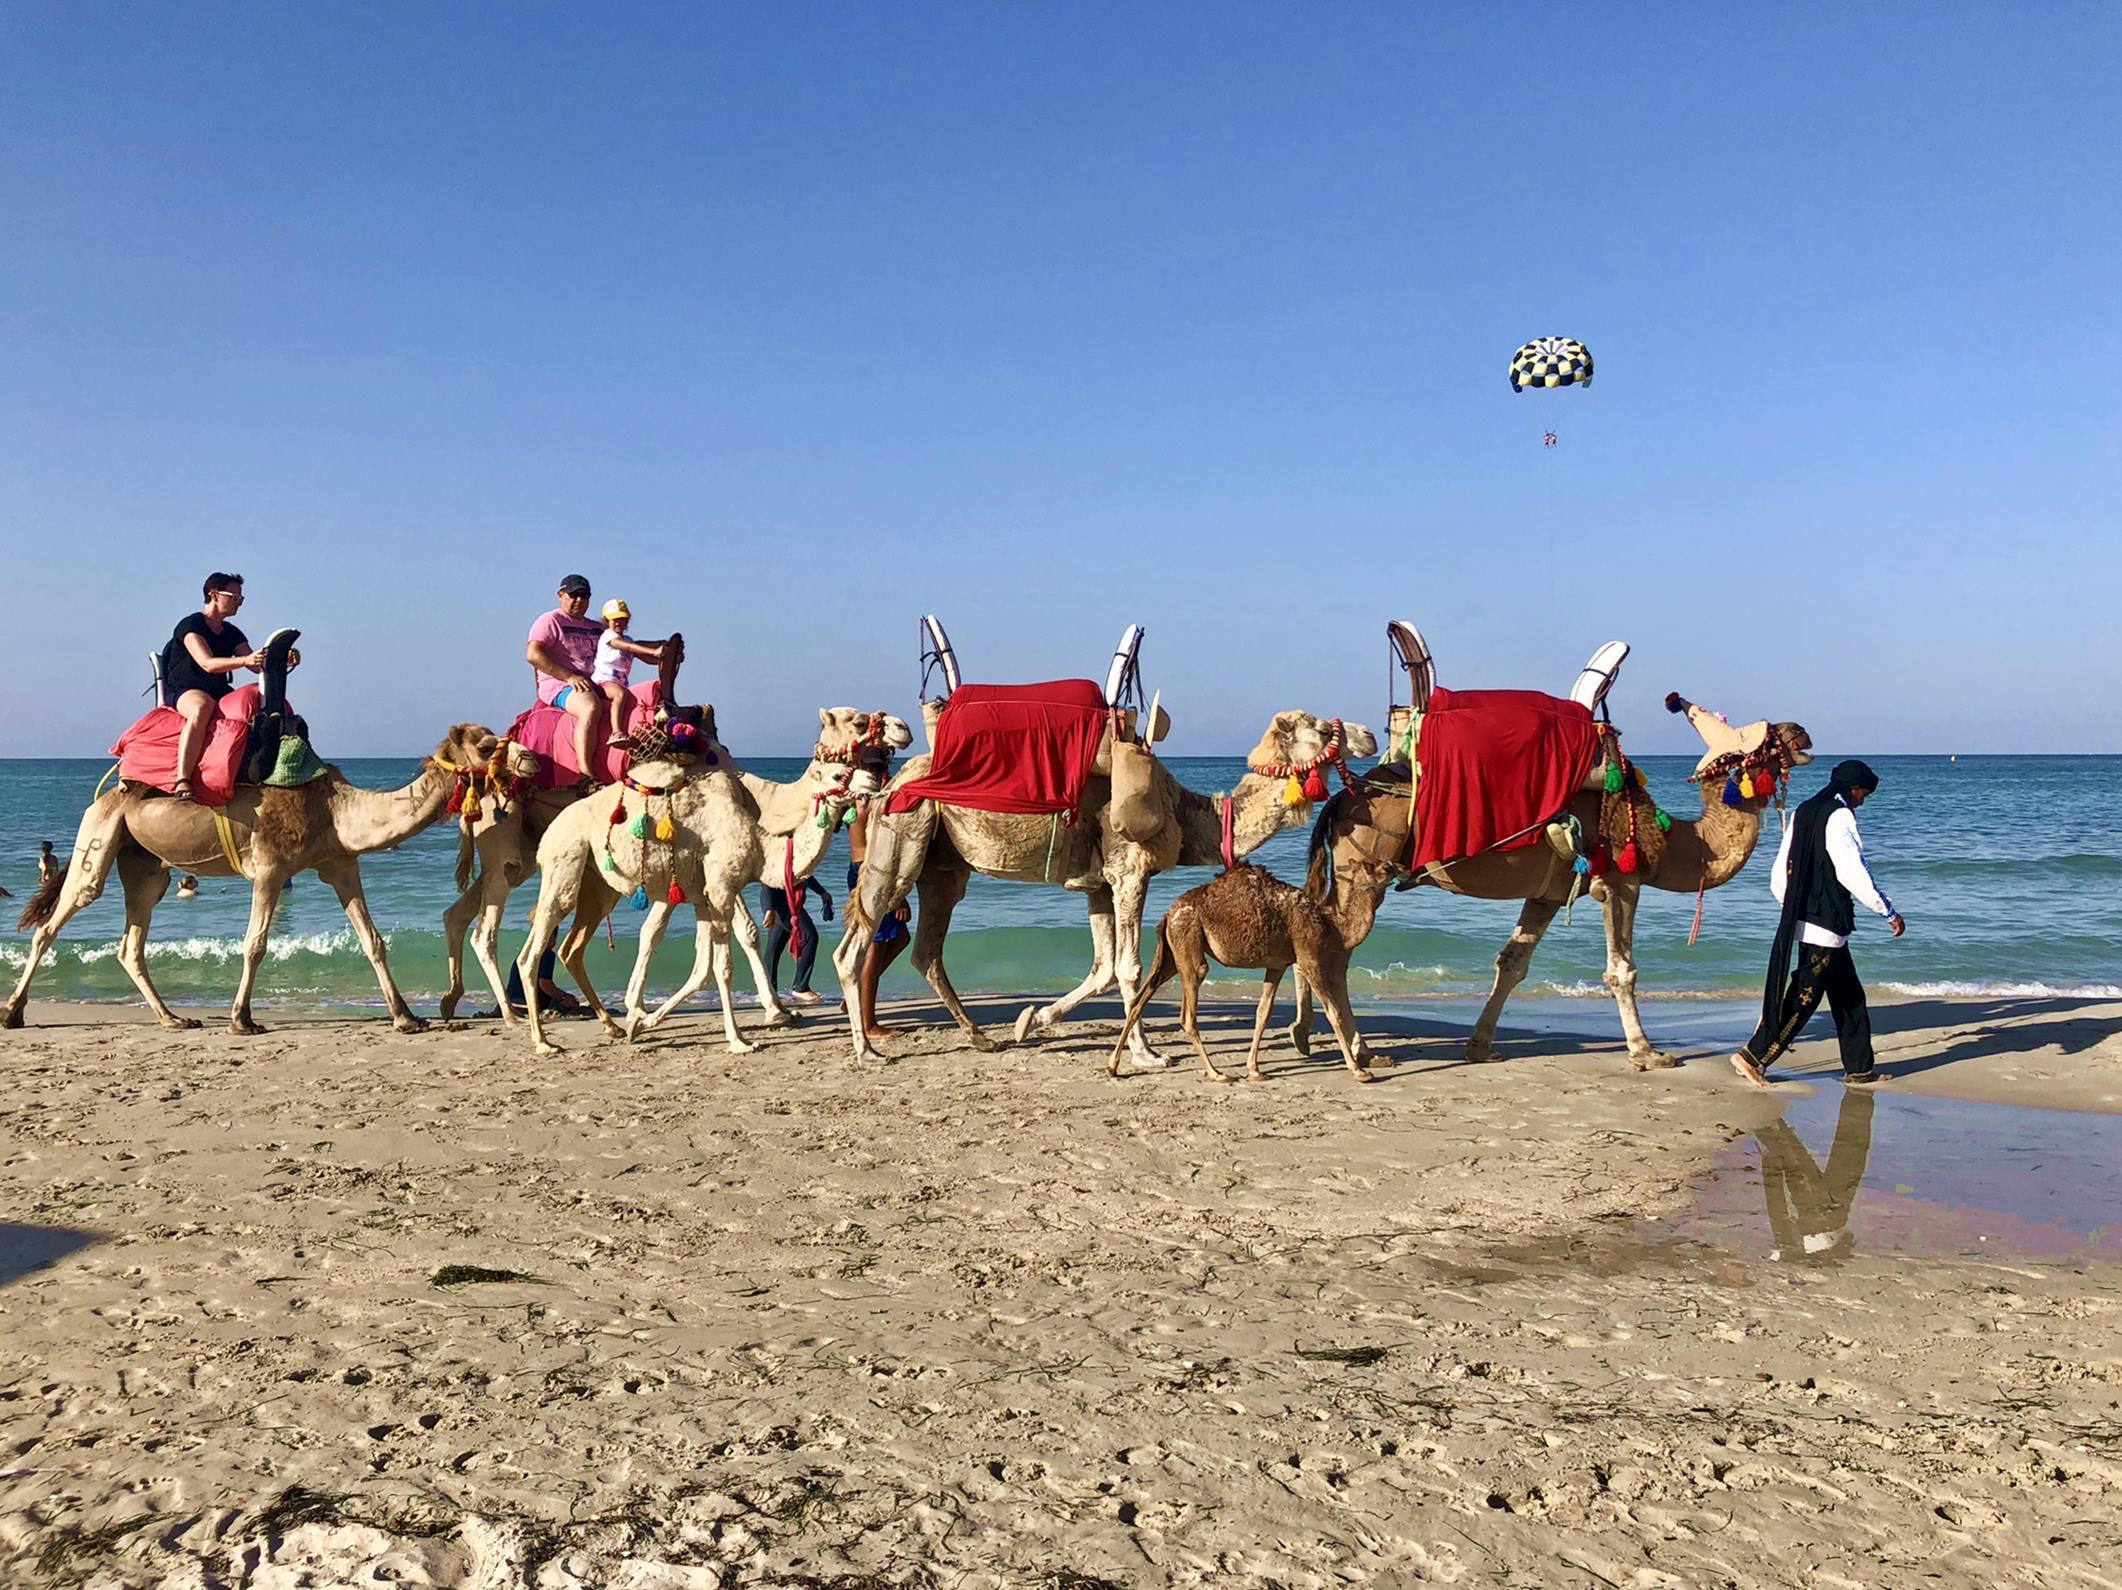 djerba_tunisia_sidimahrez_1